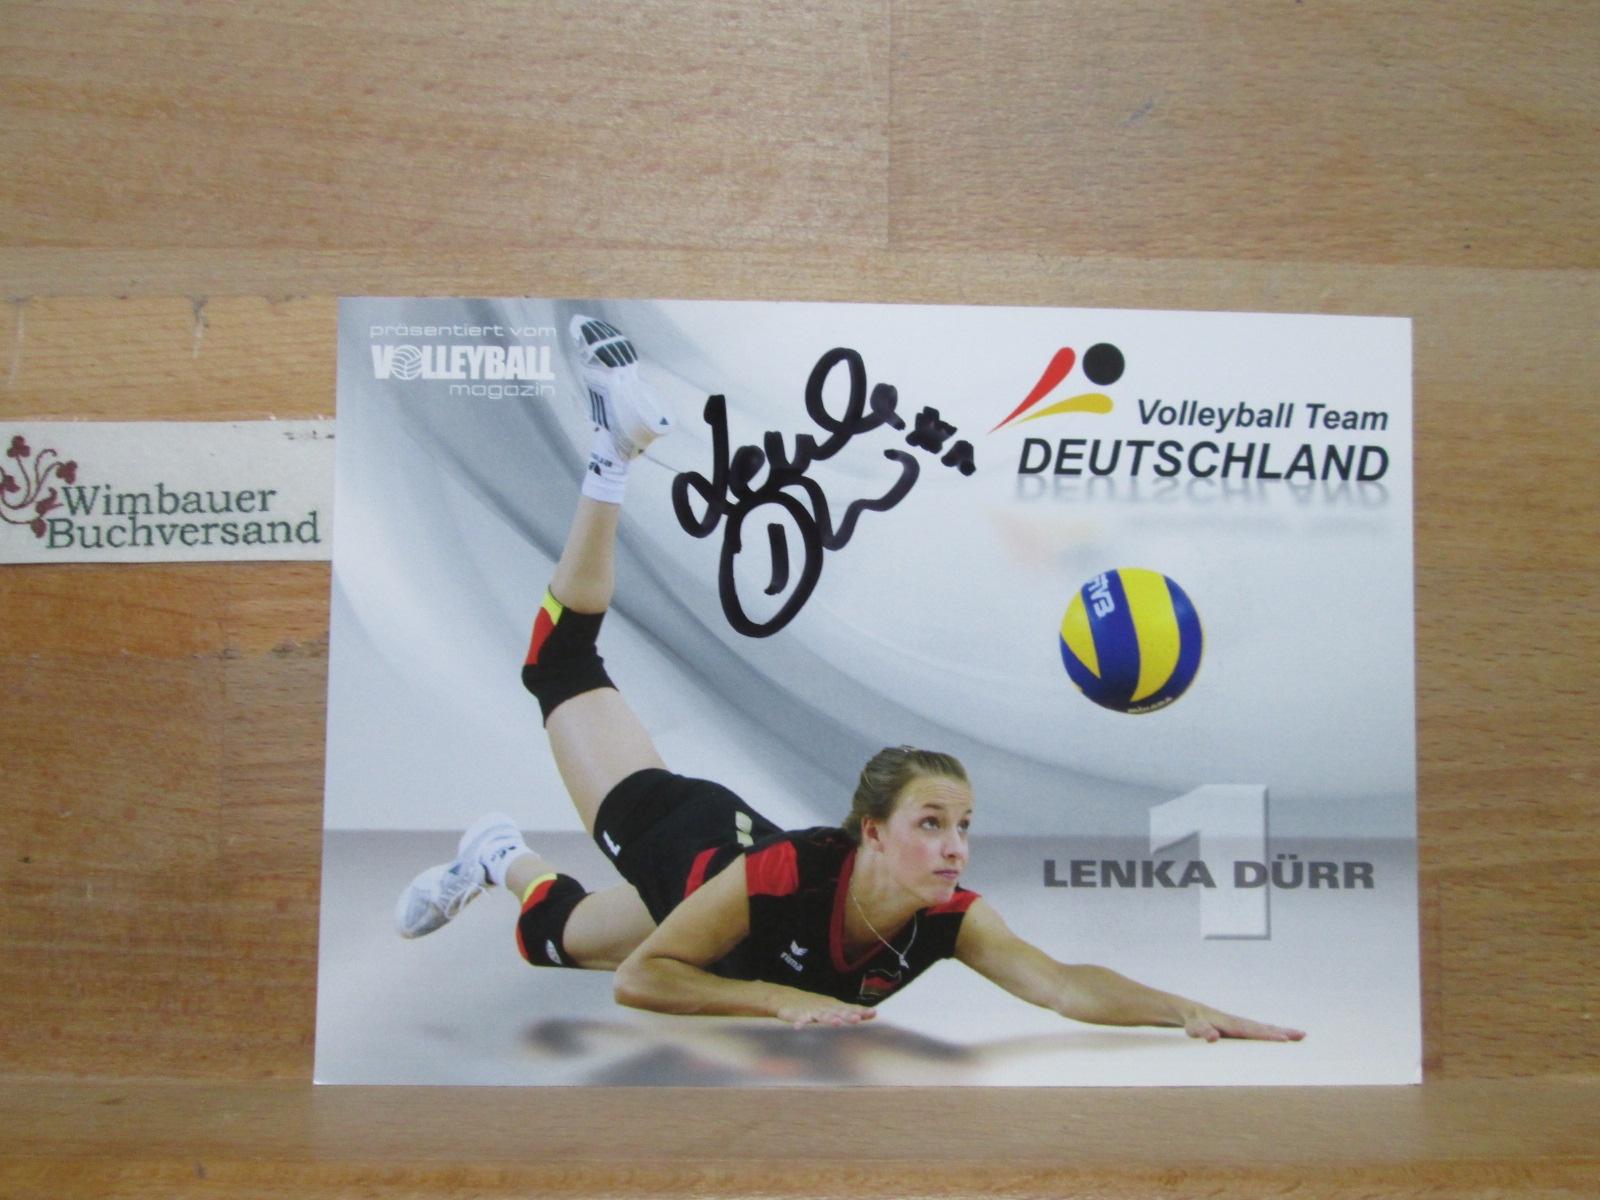 Original Autogramm Lenka Dürr Volleyball Team Deutschland /// Autogramm Autograph signiert signed signee